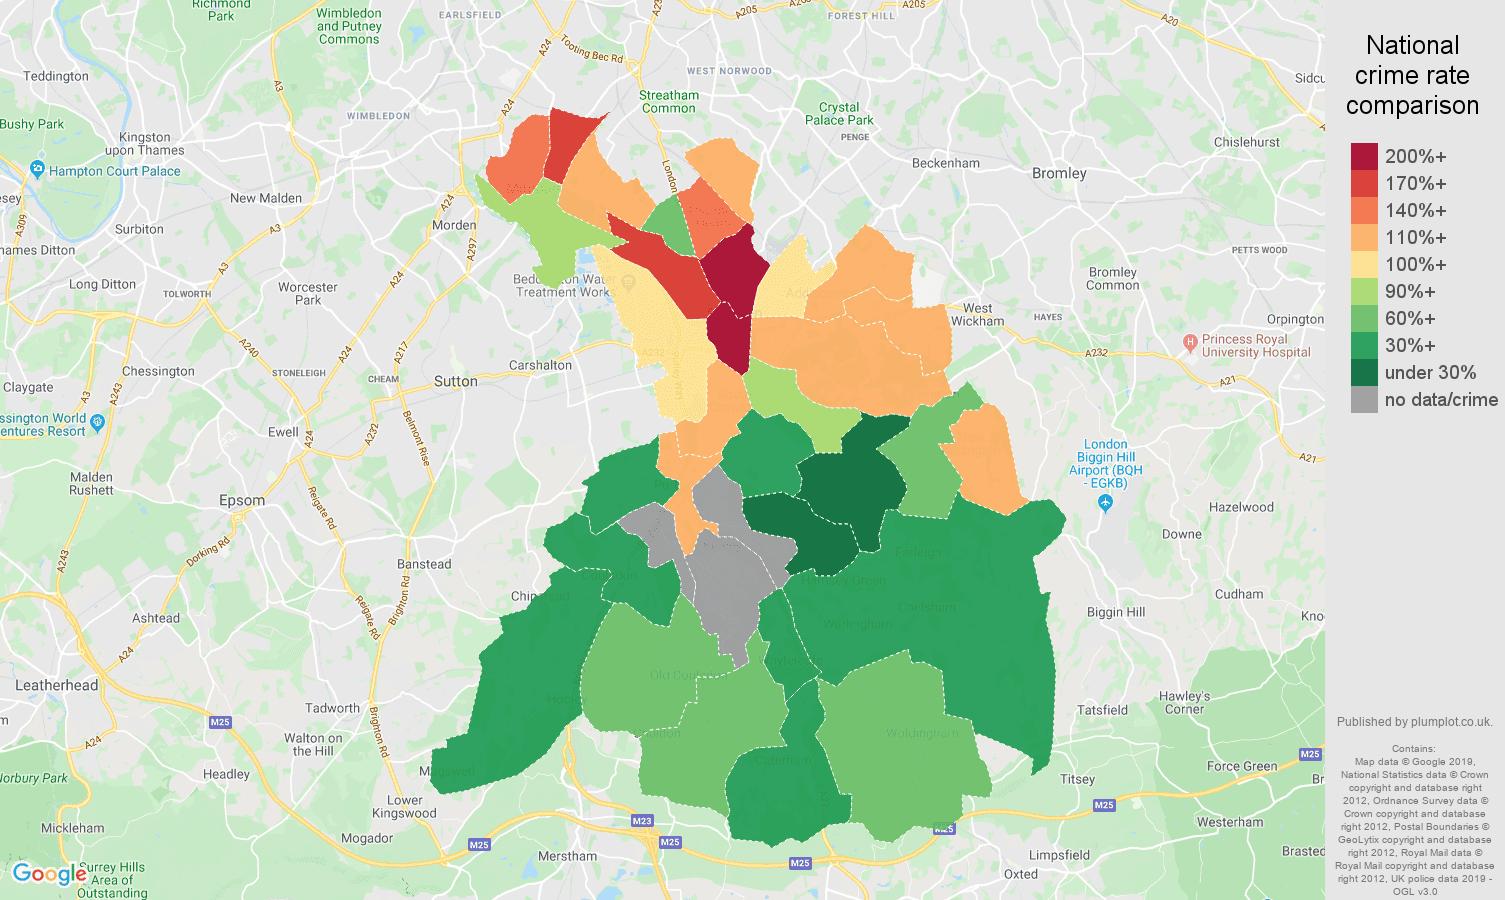 Croydon possession of weapons crime rate comparison map